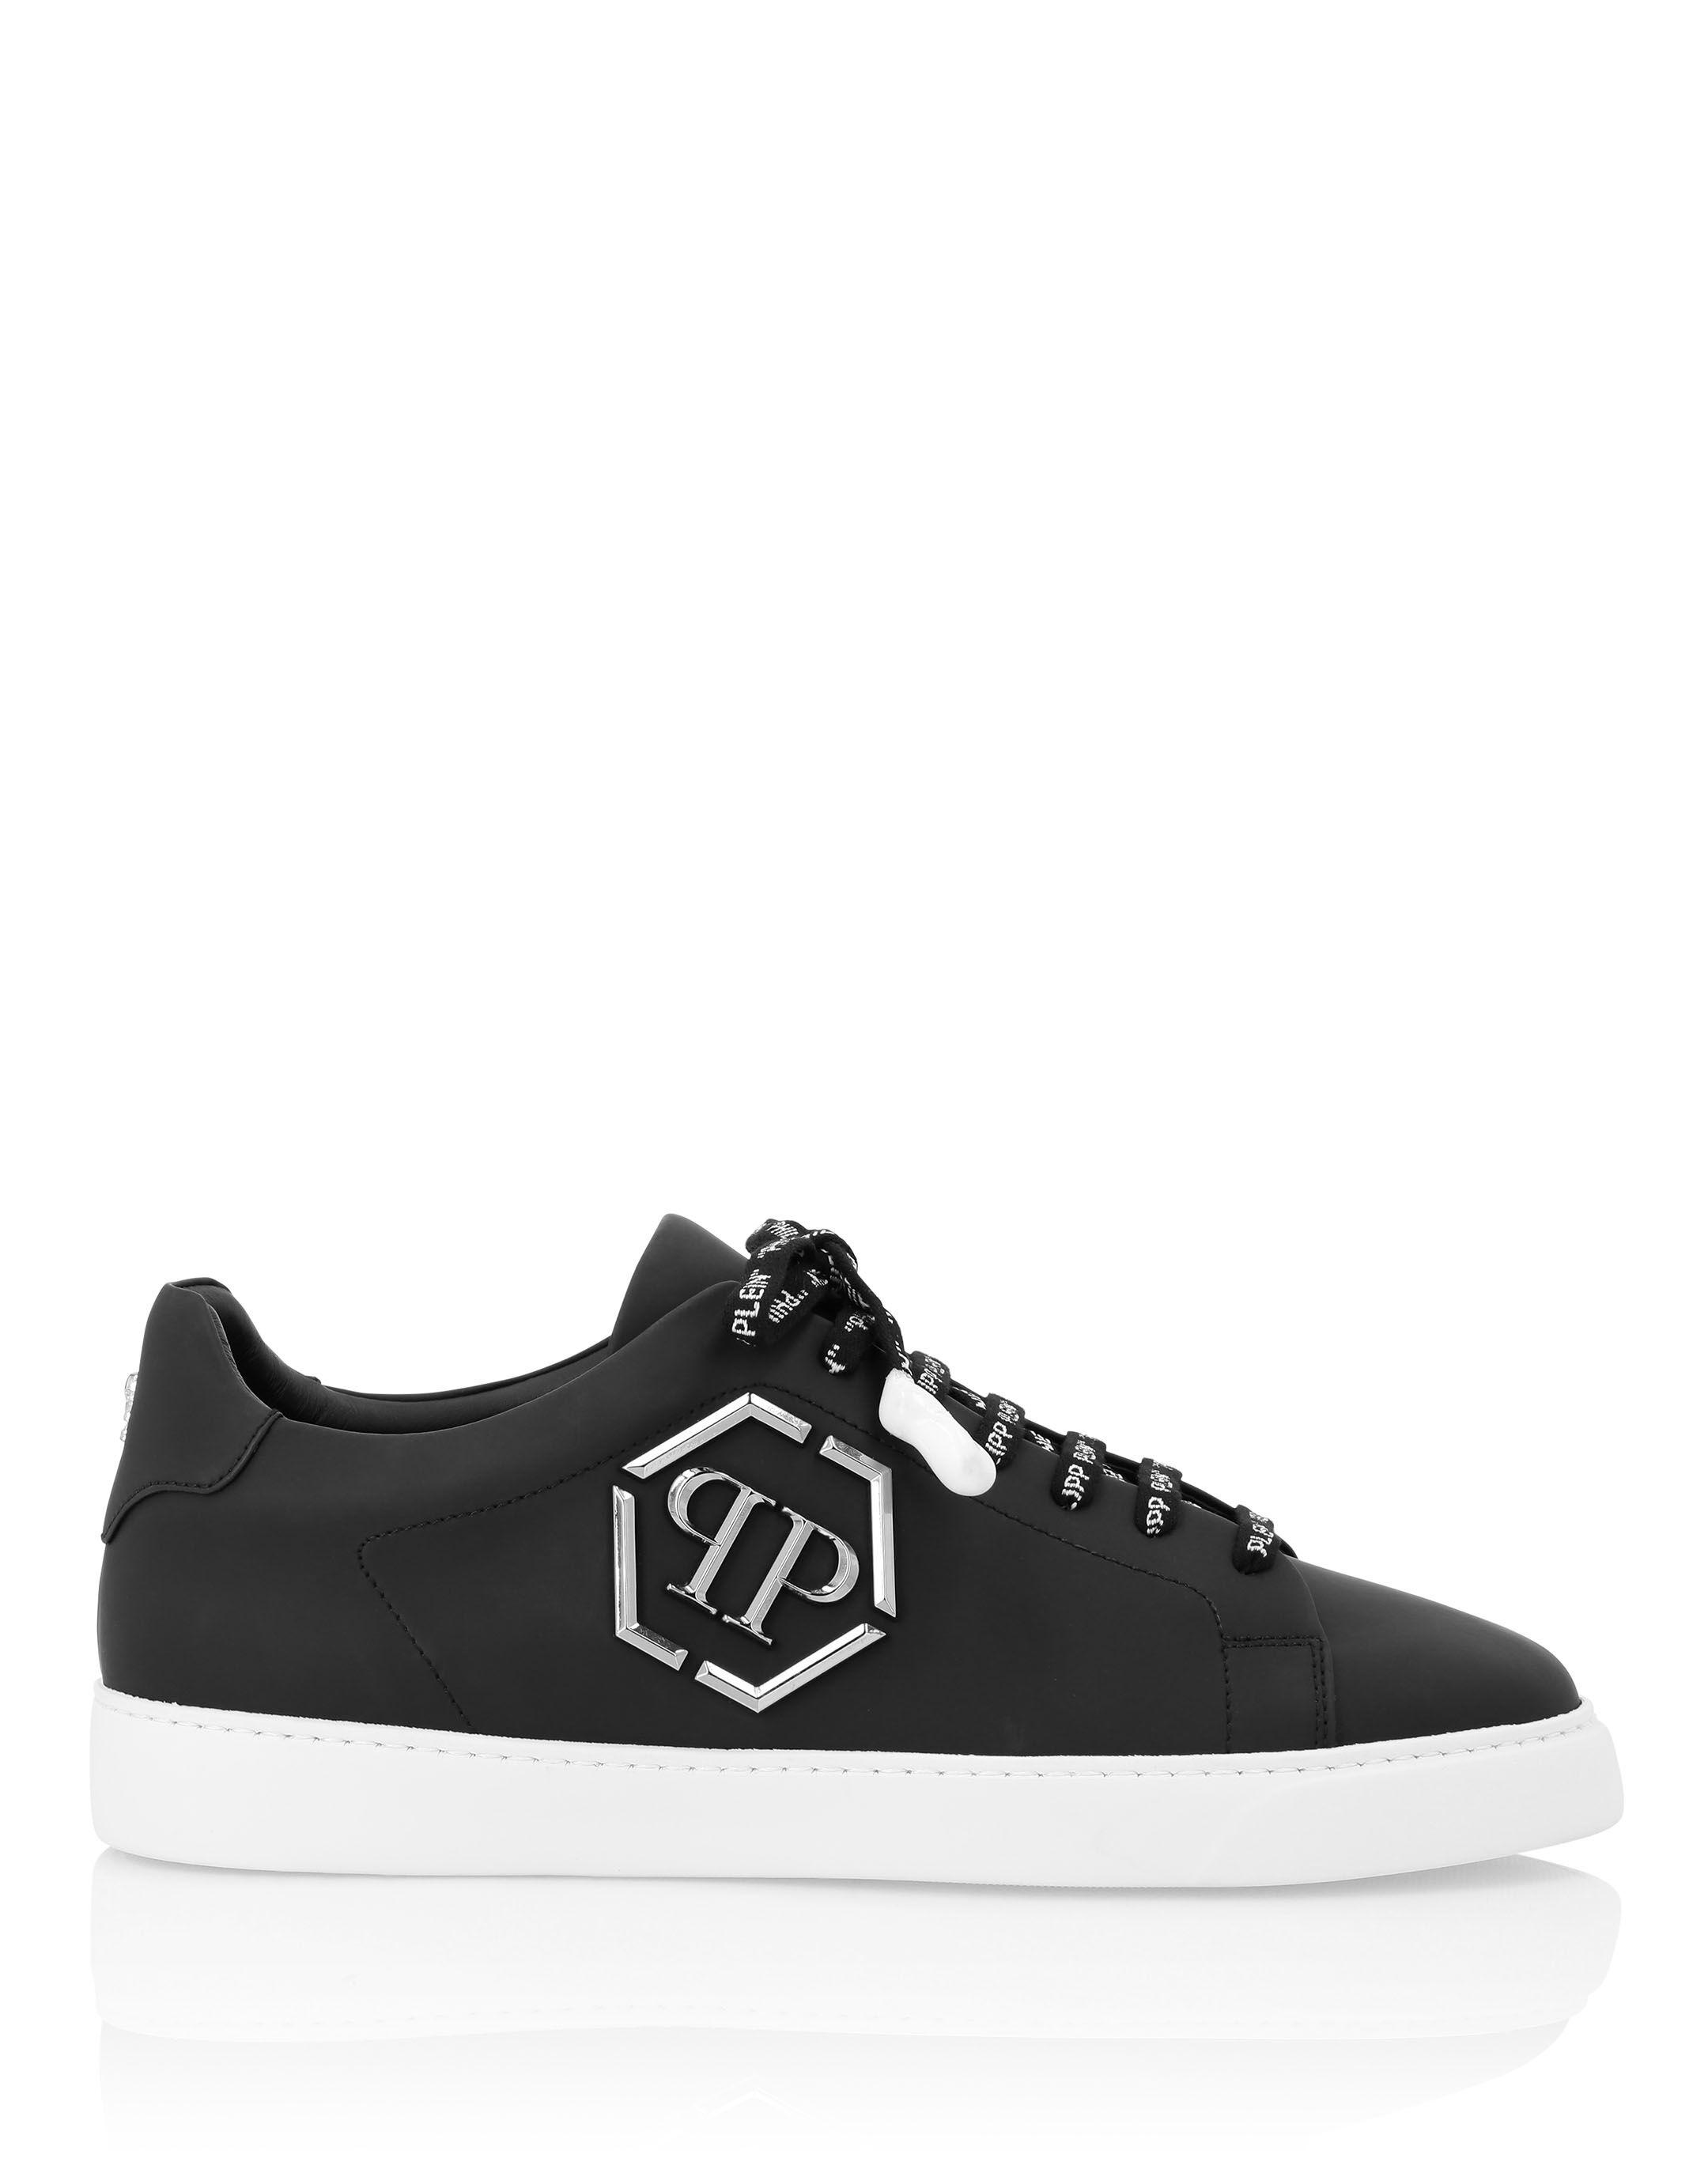 Pour Chaussures Homme Plein Philipp 7x1qz MqVpSUzG